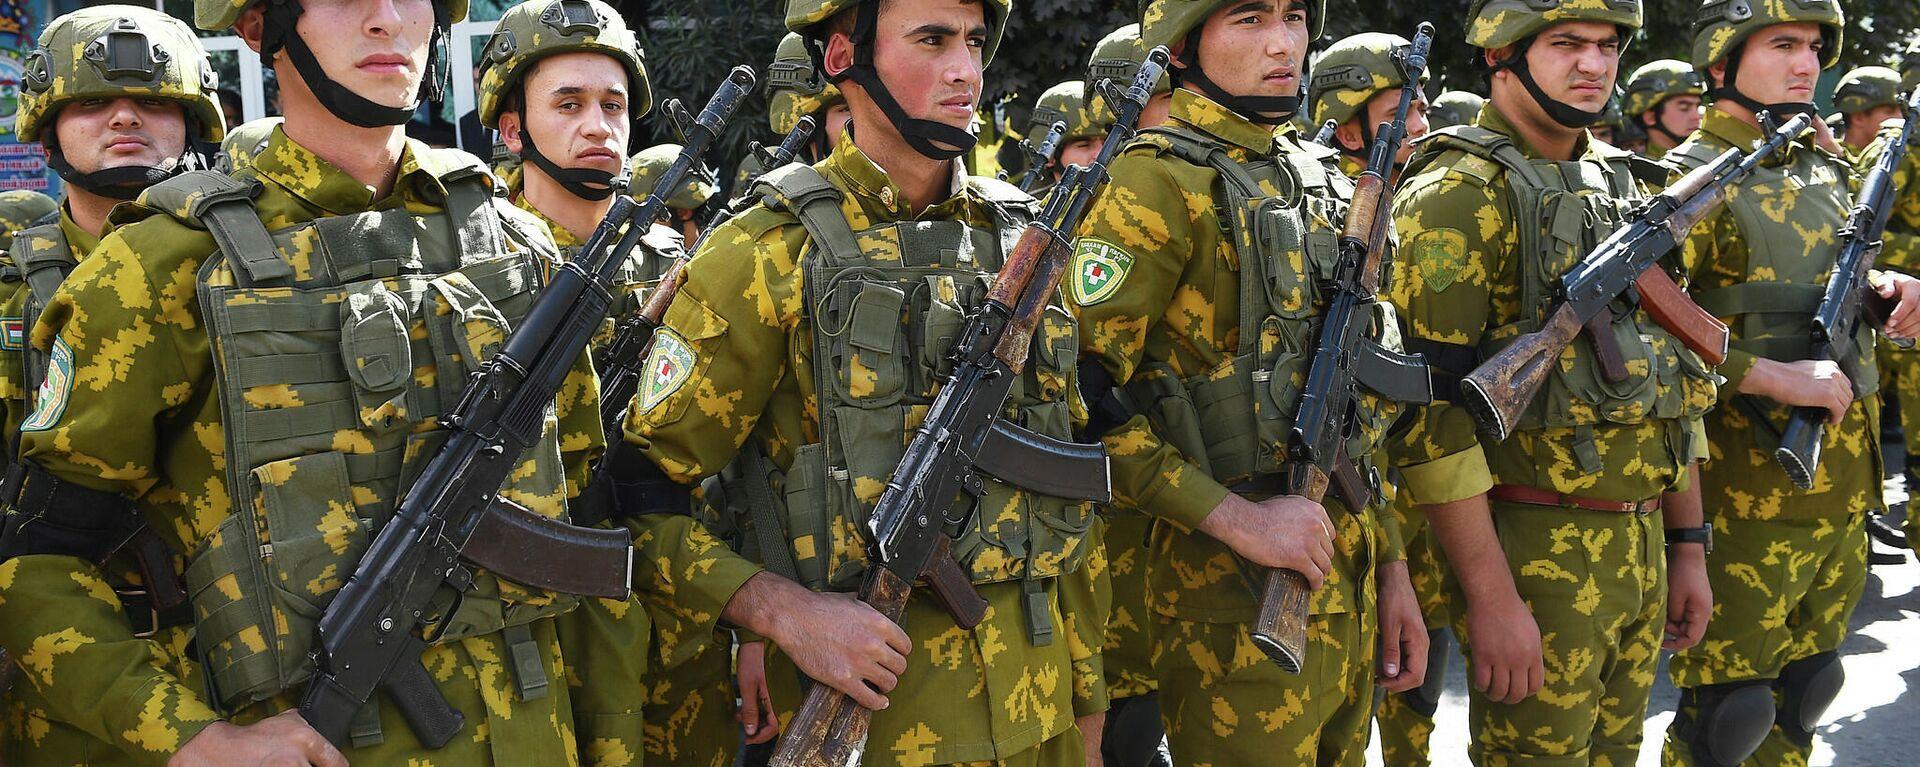 Вооруженные силы Таджикистана на военном параде в Дарвозском районе - Sputnik Таджикистан, 1920, 27.09.2021